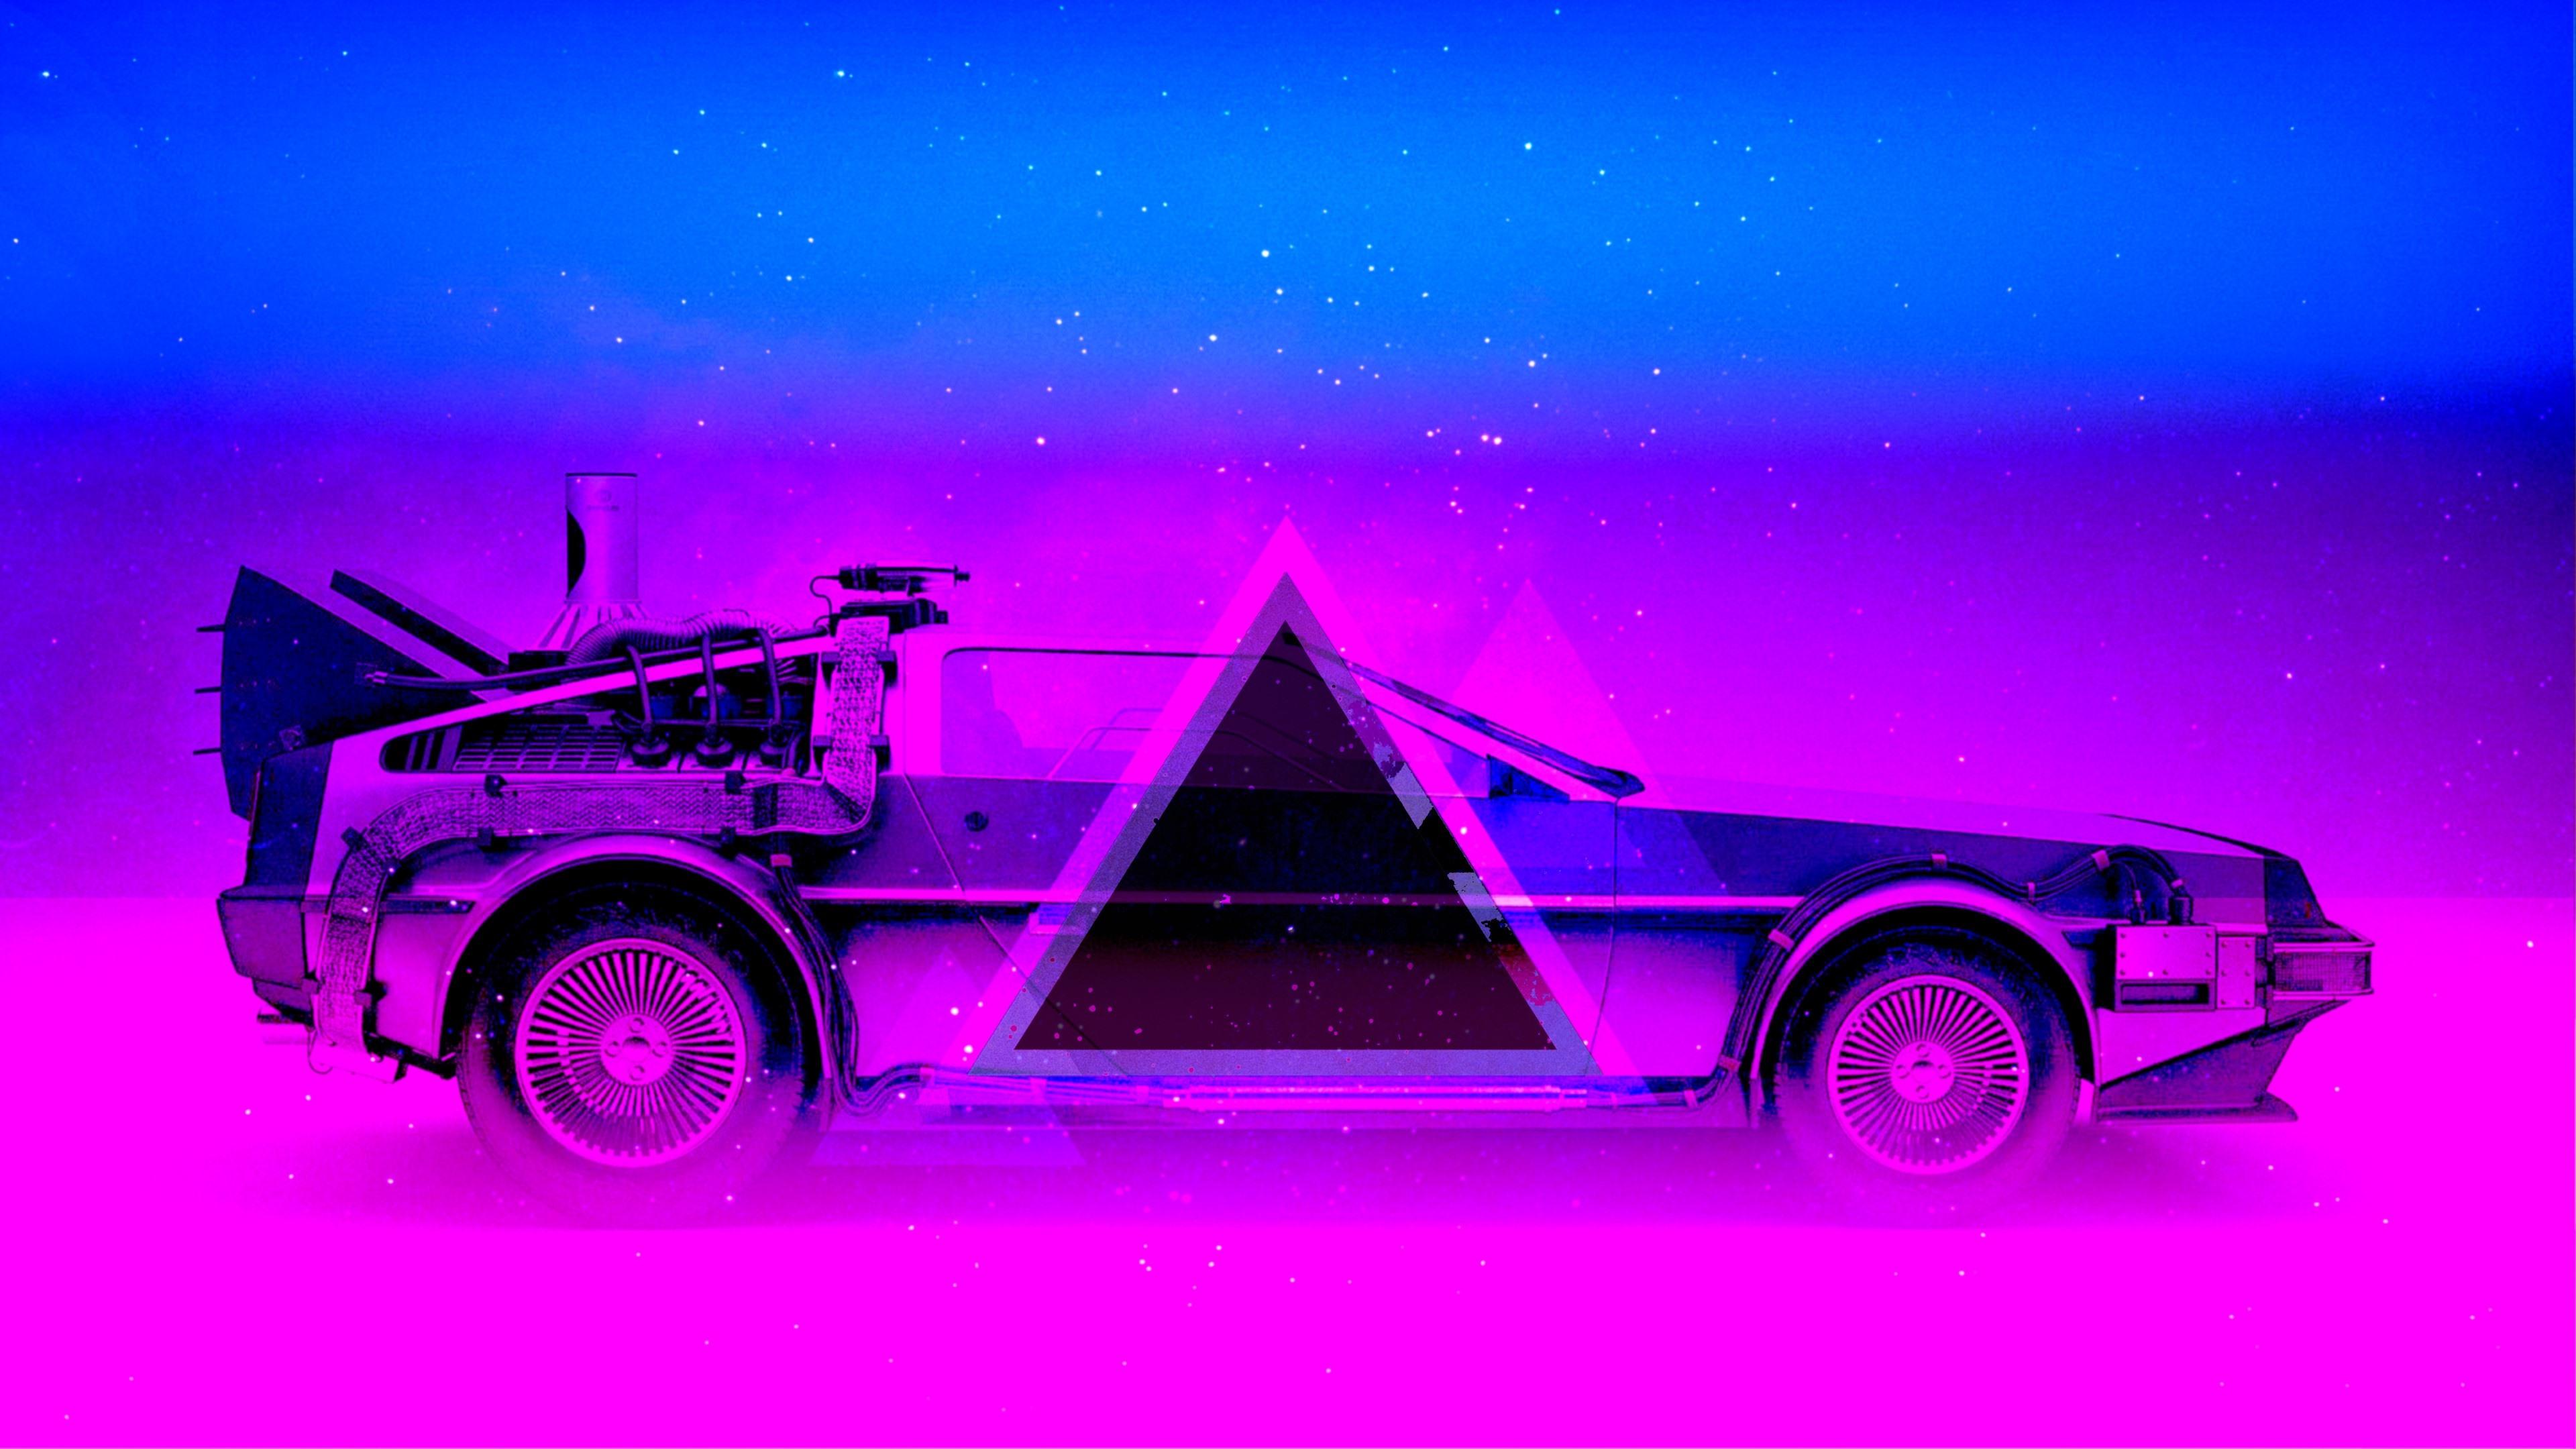 Wallpaper Car Blue And Purple Art Design 3840x2160 Uhd 4k